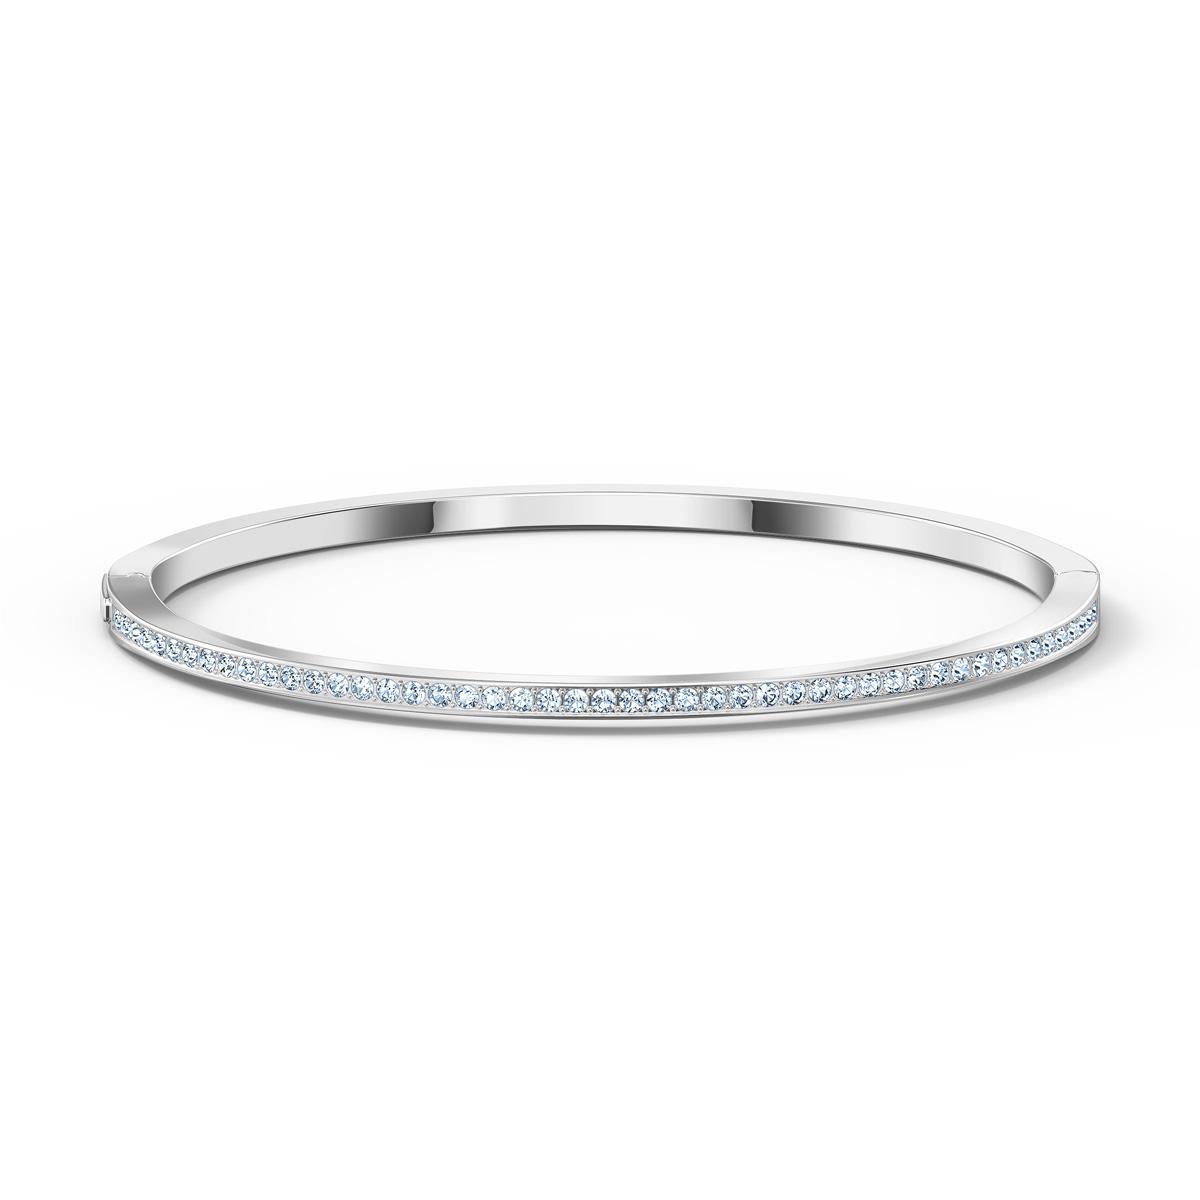 Swarovski Rare Bangle Bracelet, White, Rhodium Plated